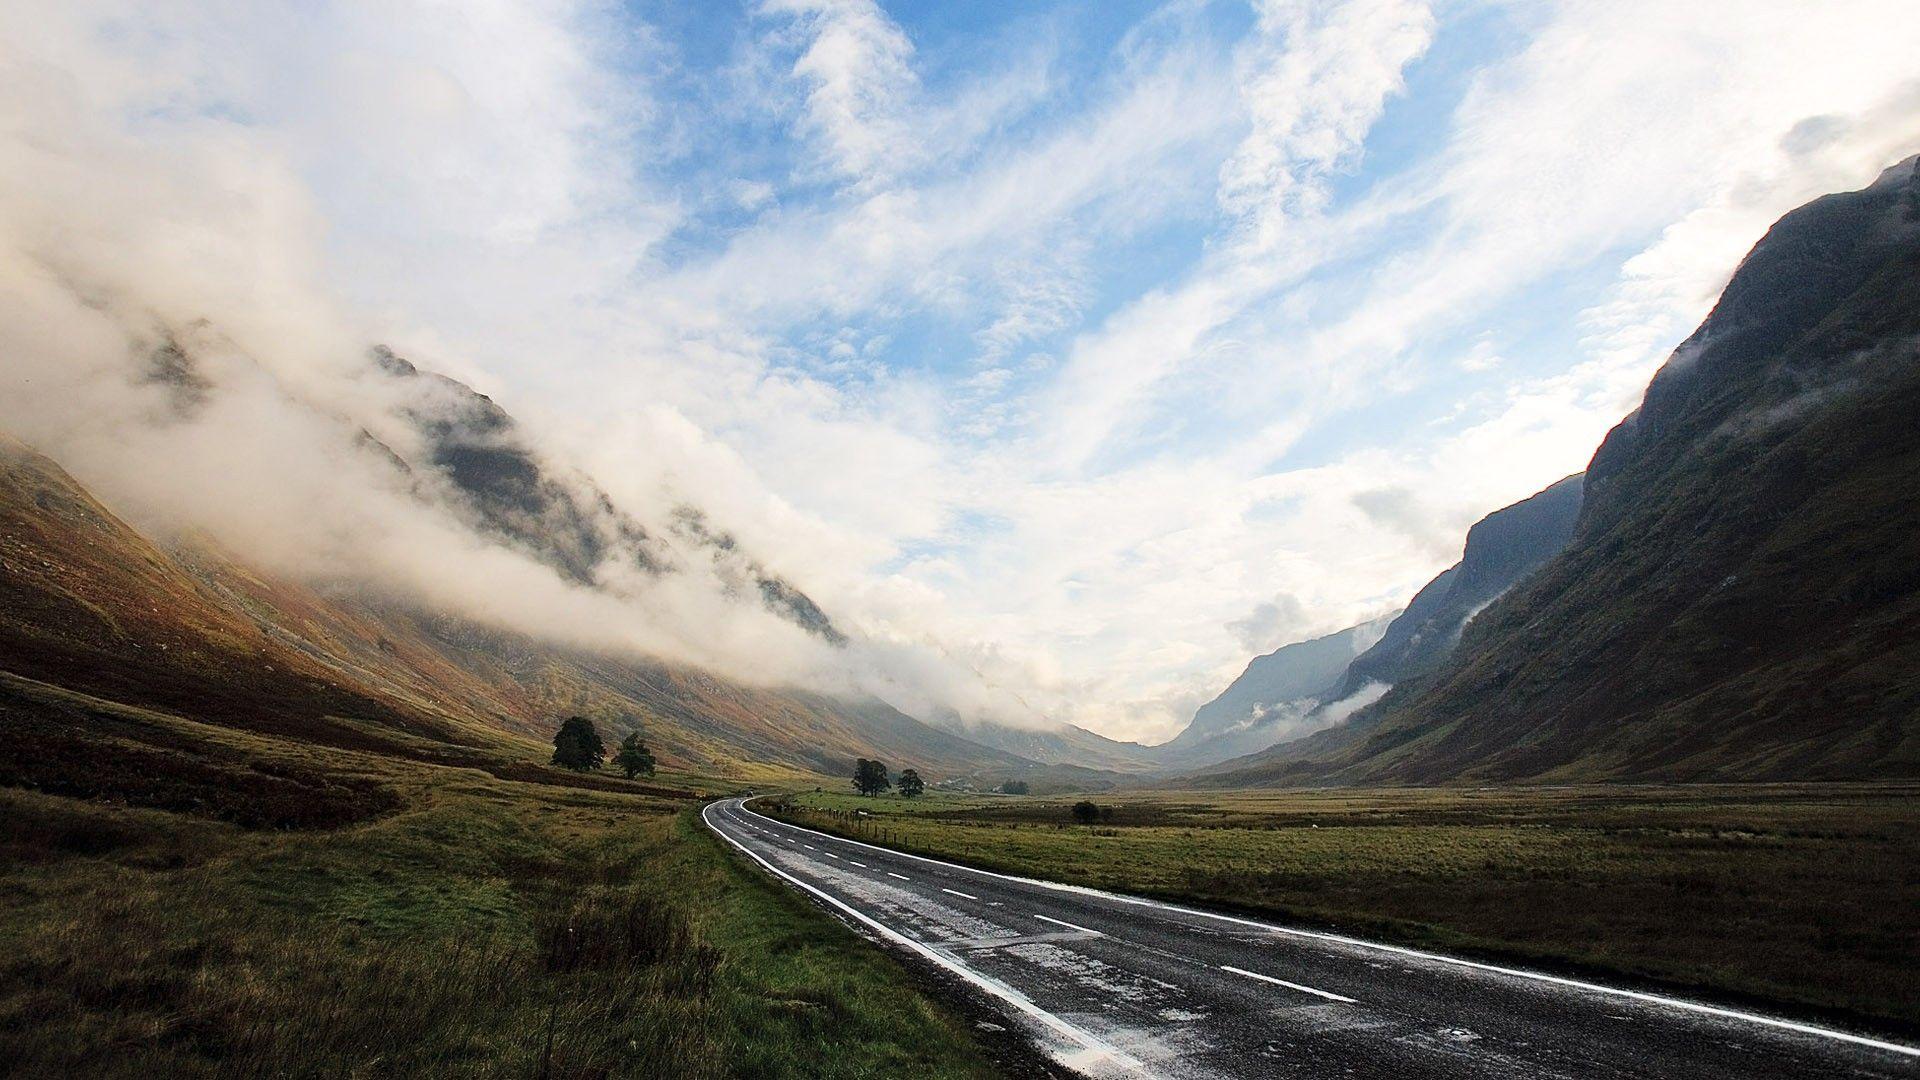 scotland wallpaper hd | category nature tags glencoe scotland